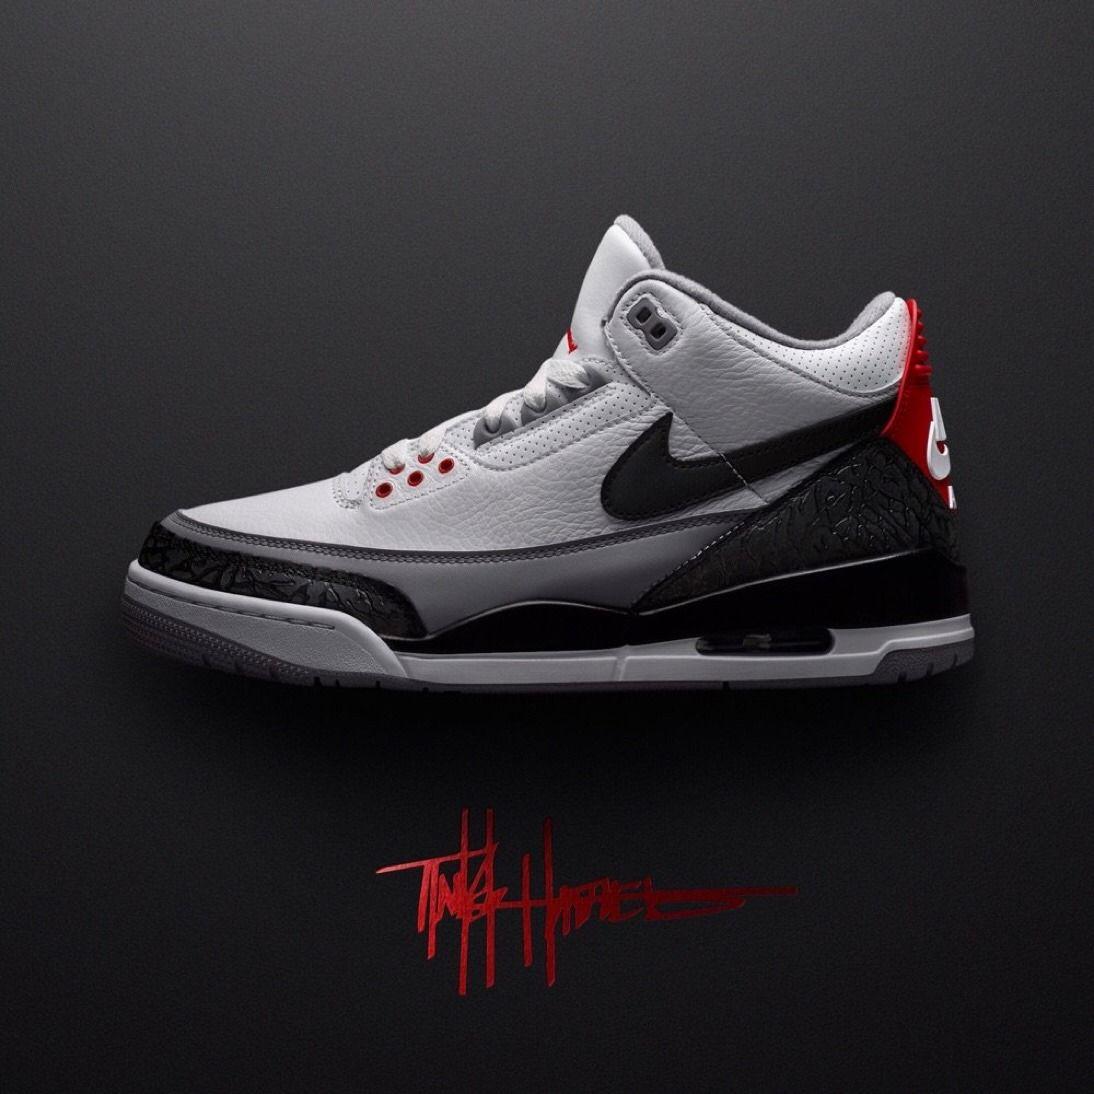 Jordan 3 Retro Tinker NRG | Sneakers men fashion, Air jordans ...